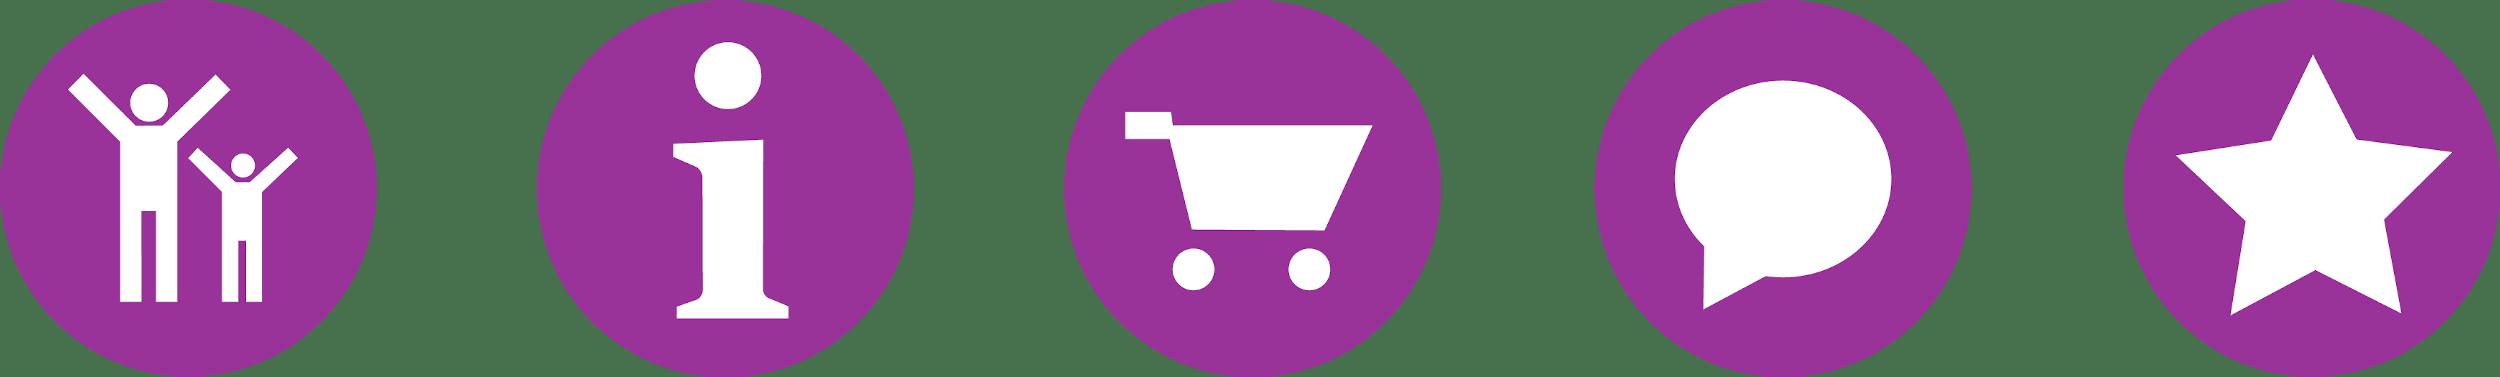 iFlow-Customer-Experience